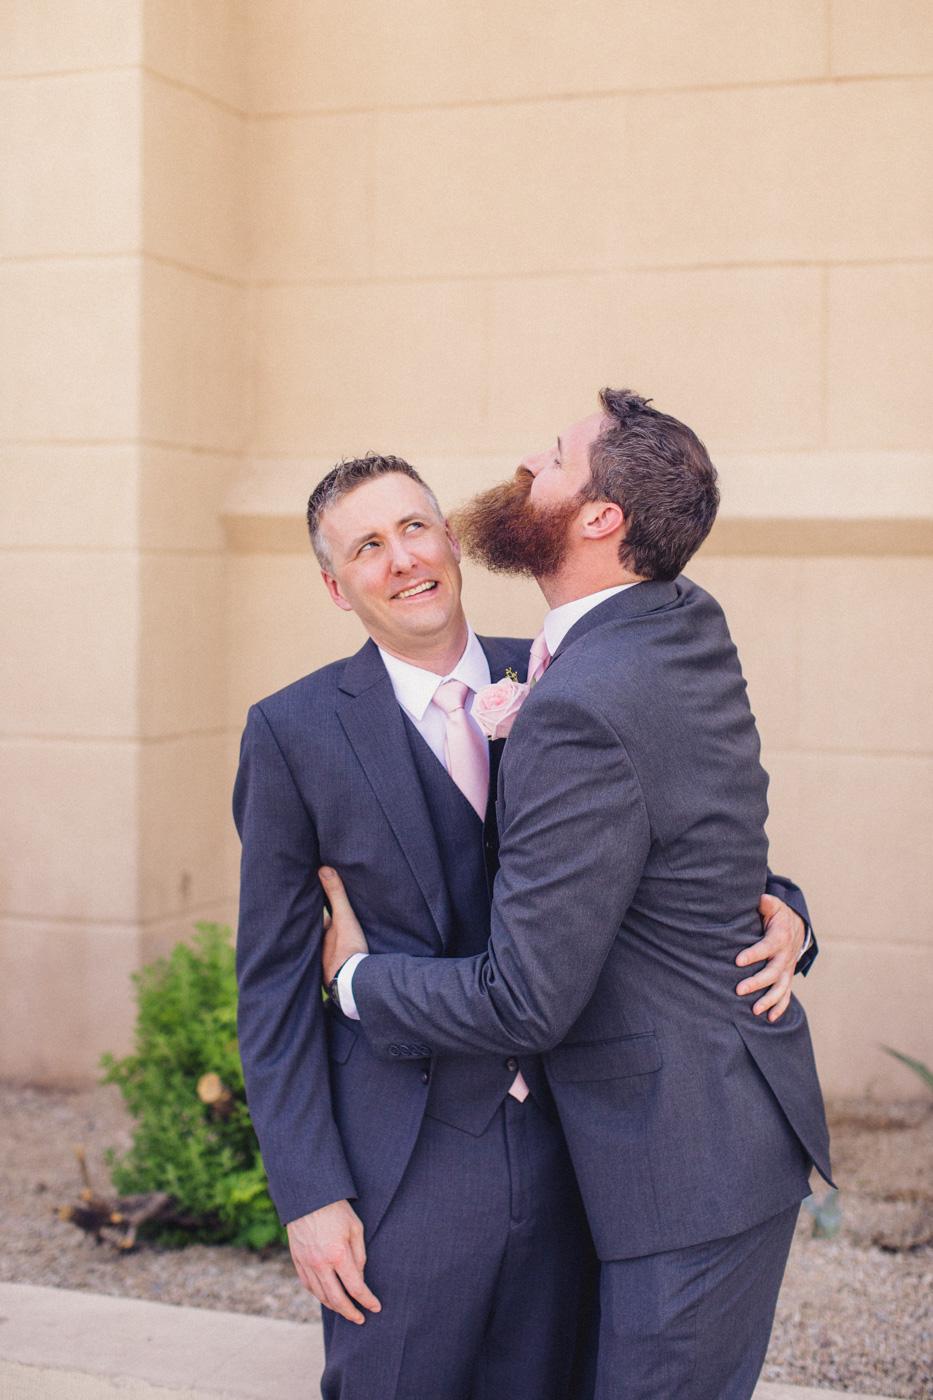 hilarious-groomsman-and-groom-photo